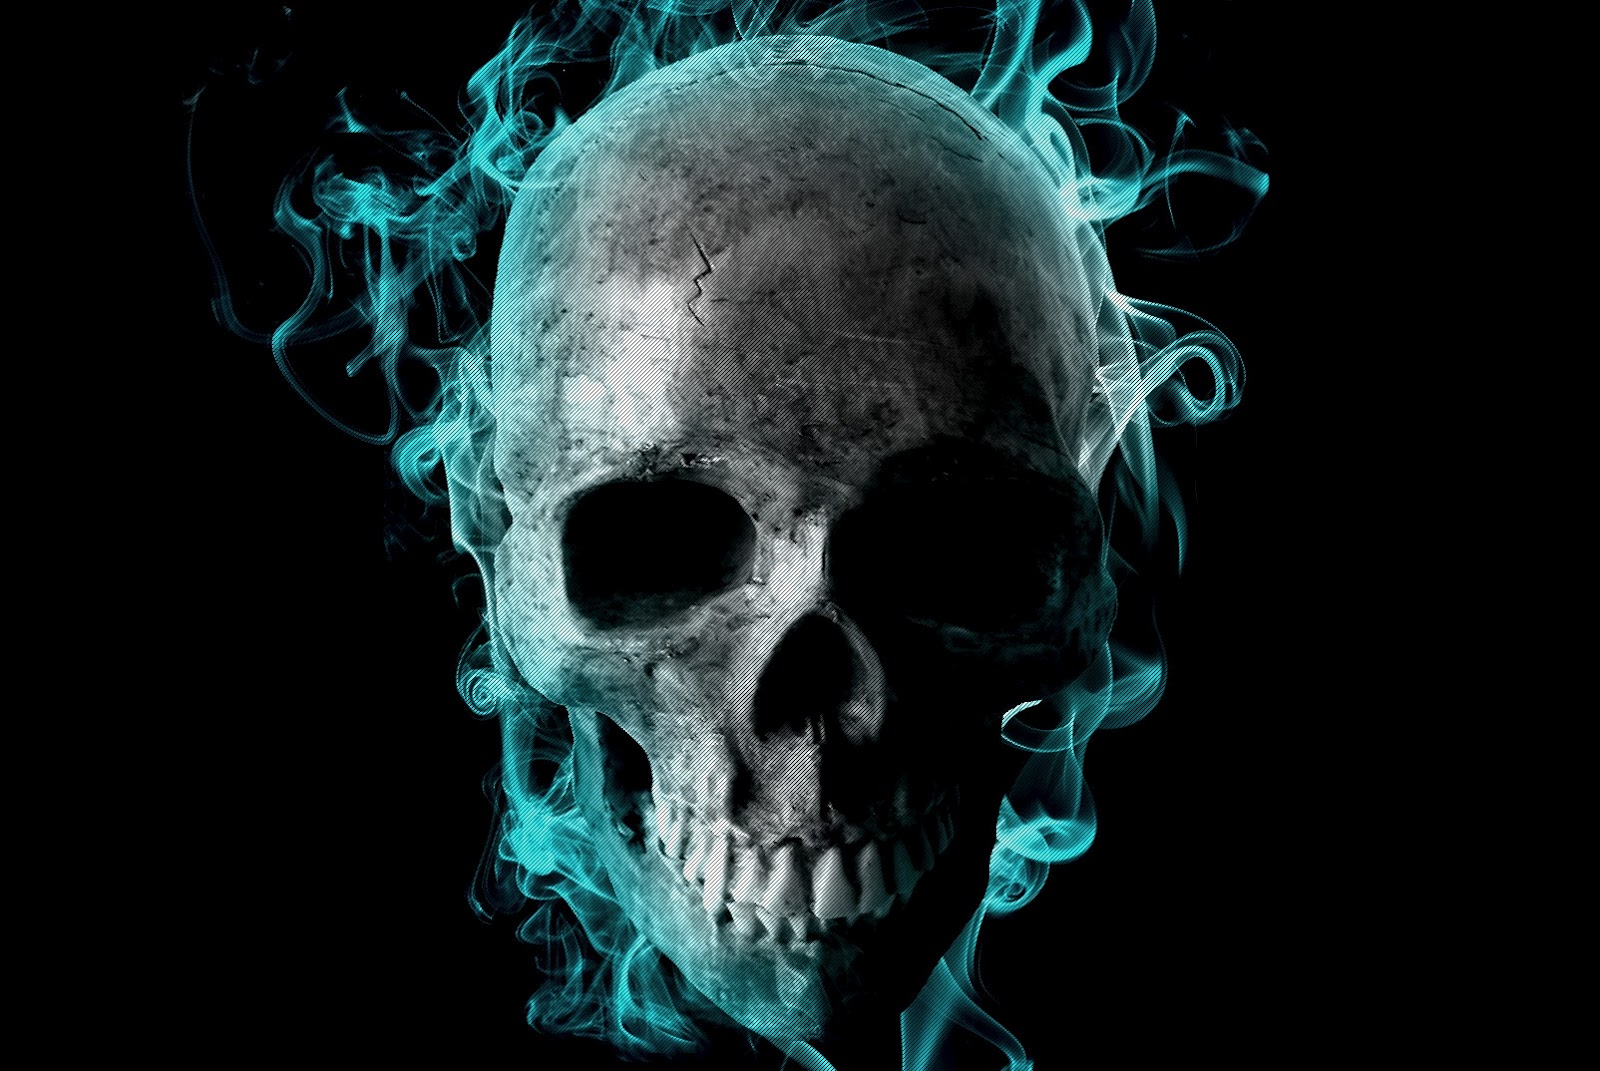 Beautiful HD Wallpapers: Skull Wallpaper